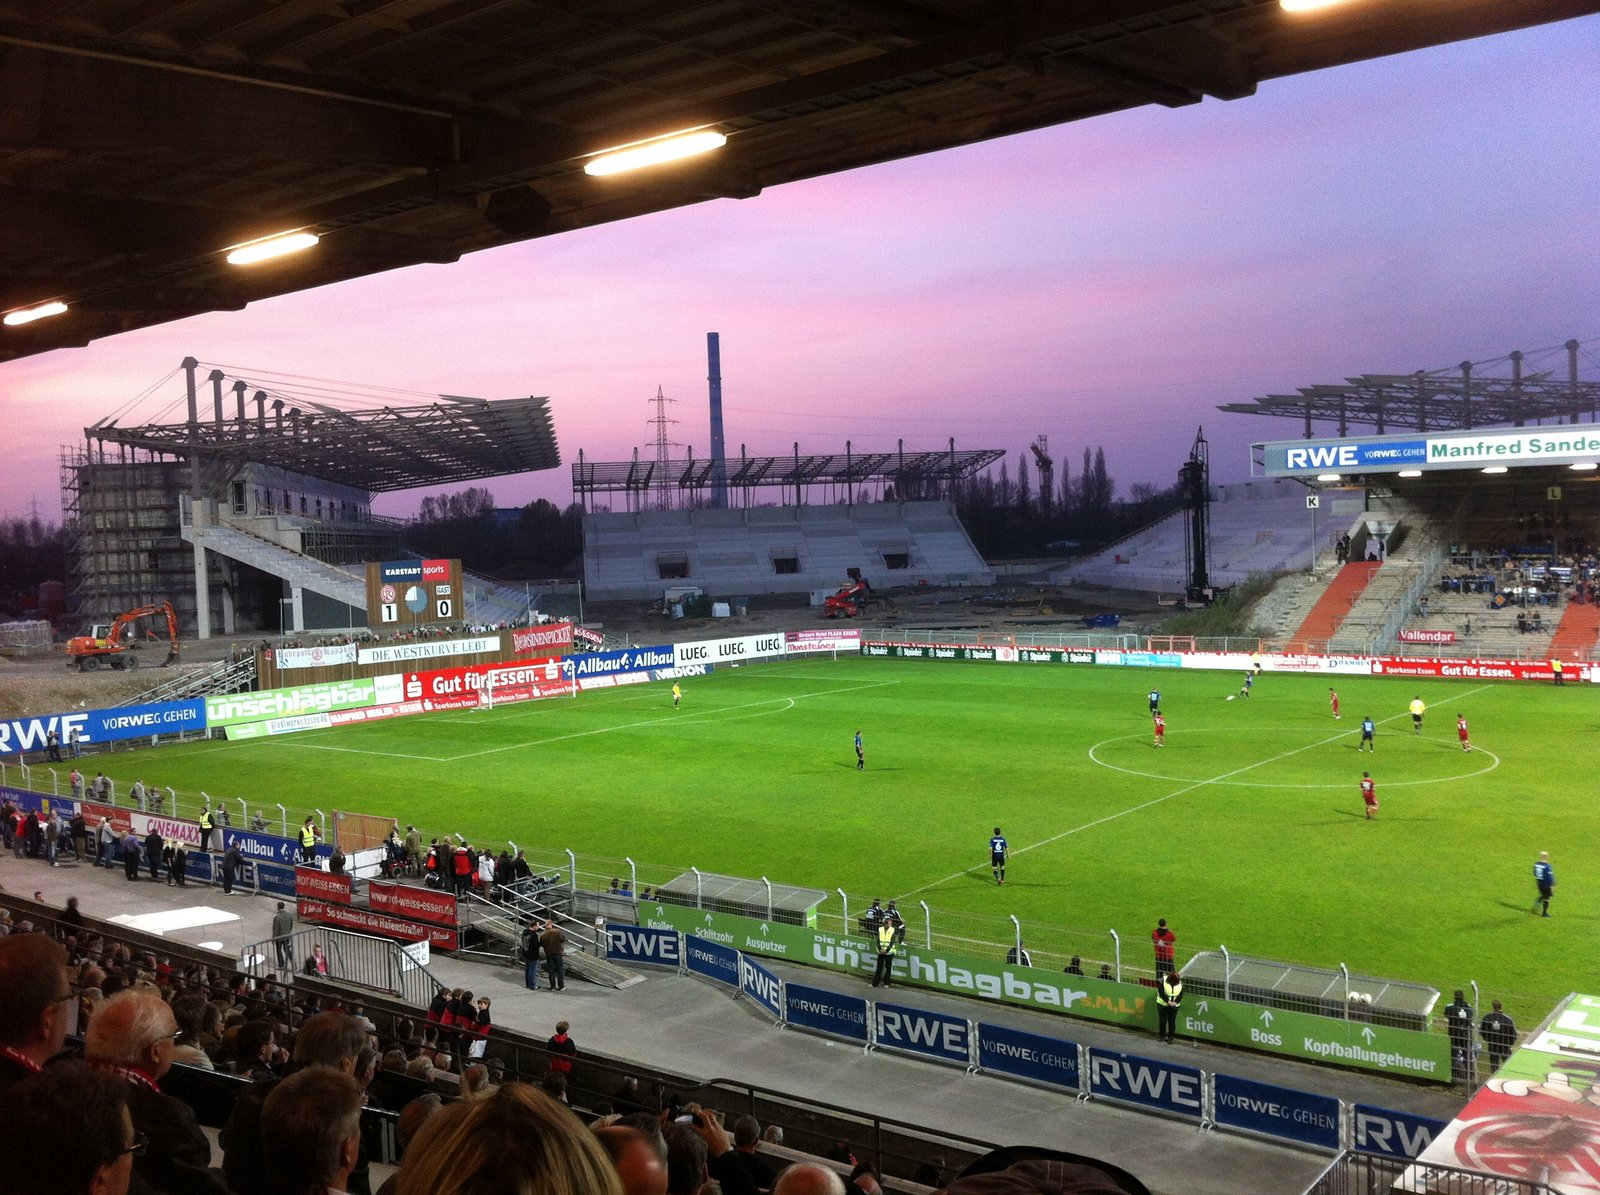 Georg Melches Stadion